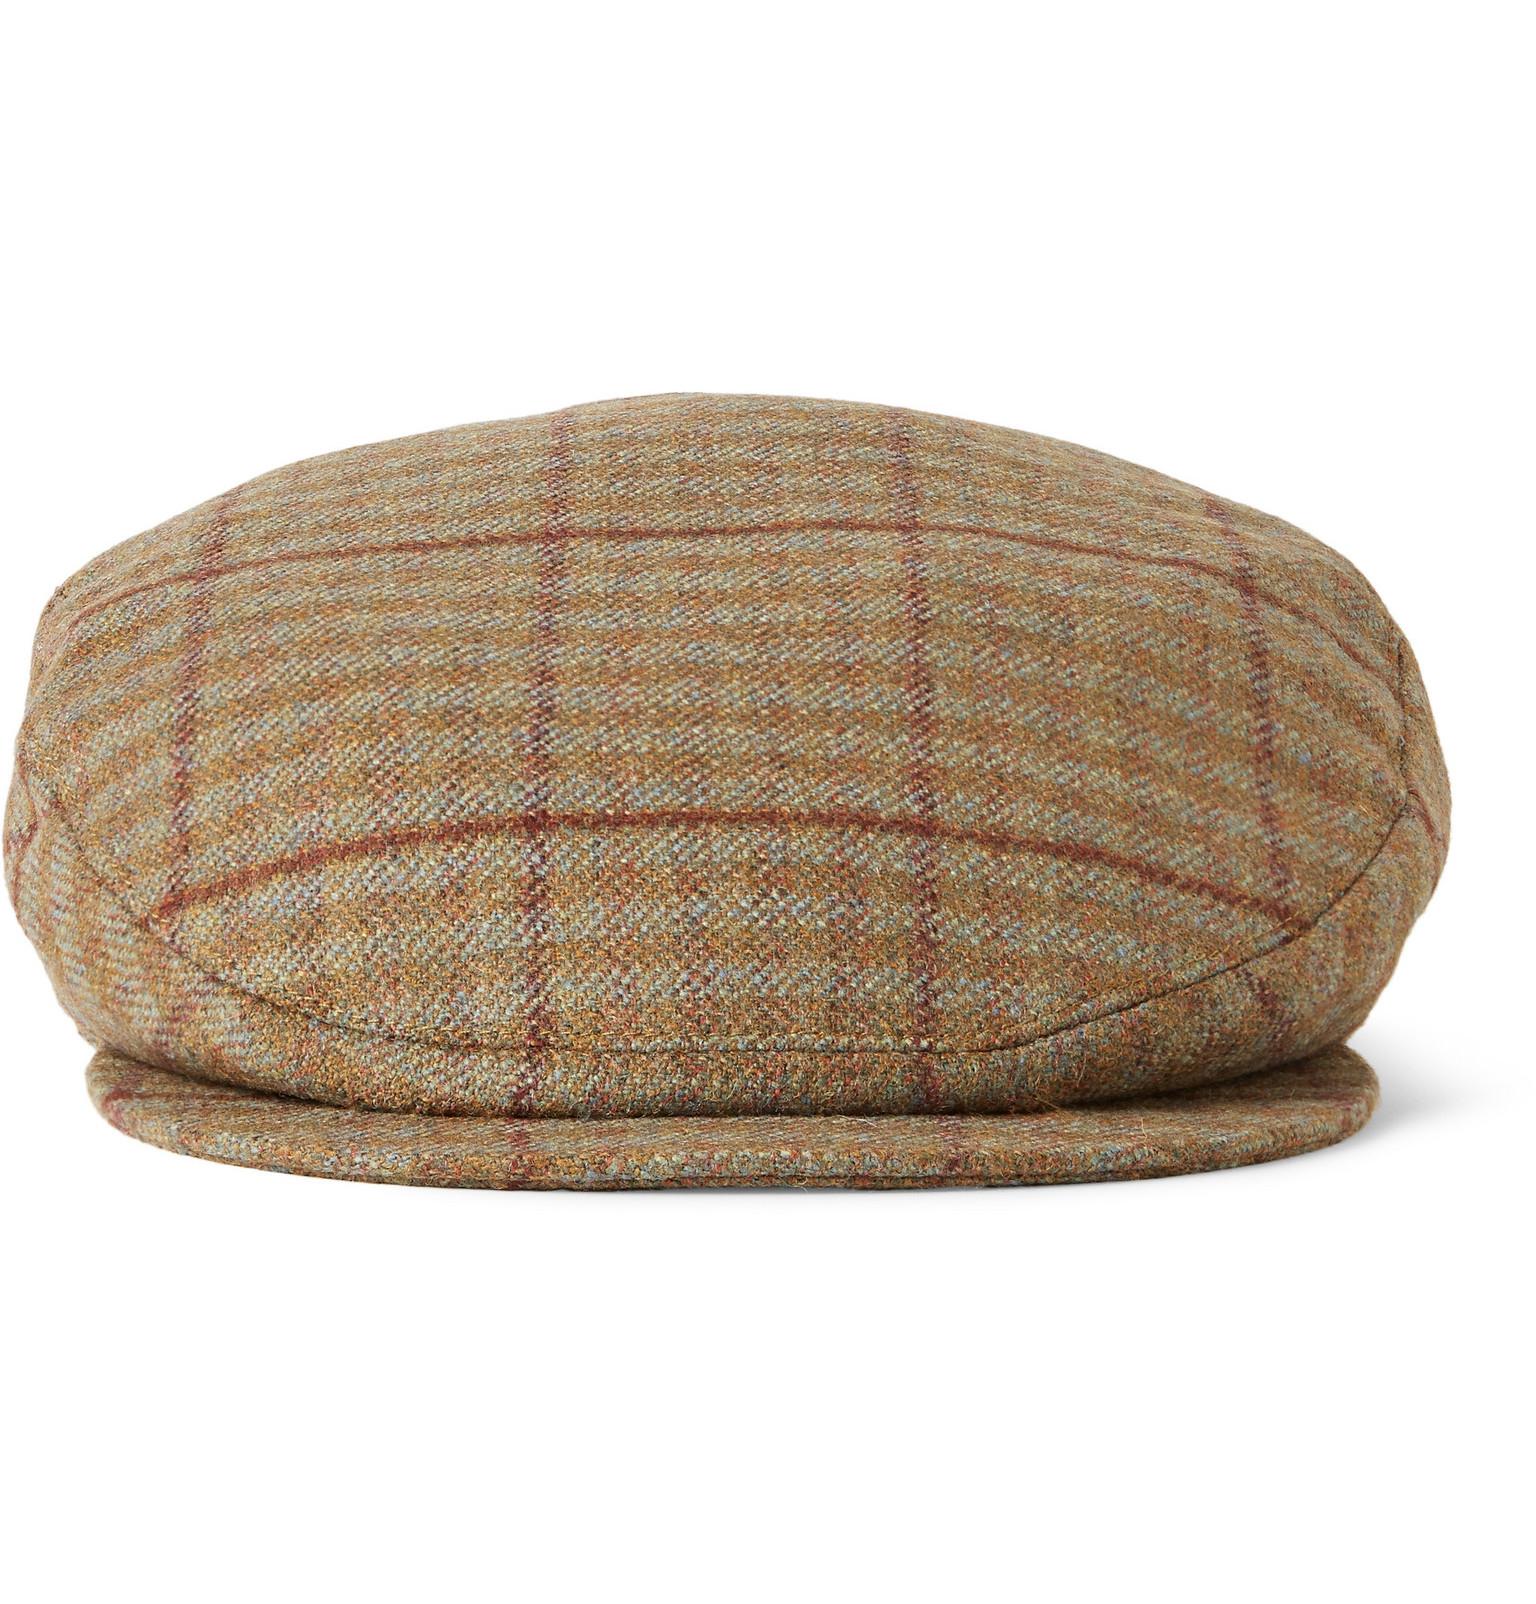 dbf422922fc32 Musto Shooting Checked Wool-blend Tweed Flat Cap in Brown for Men - Lyst